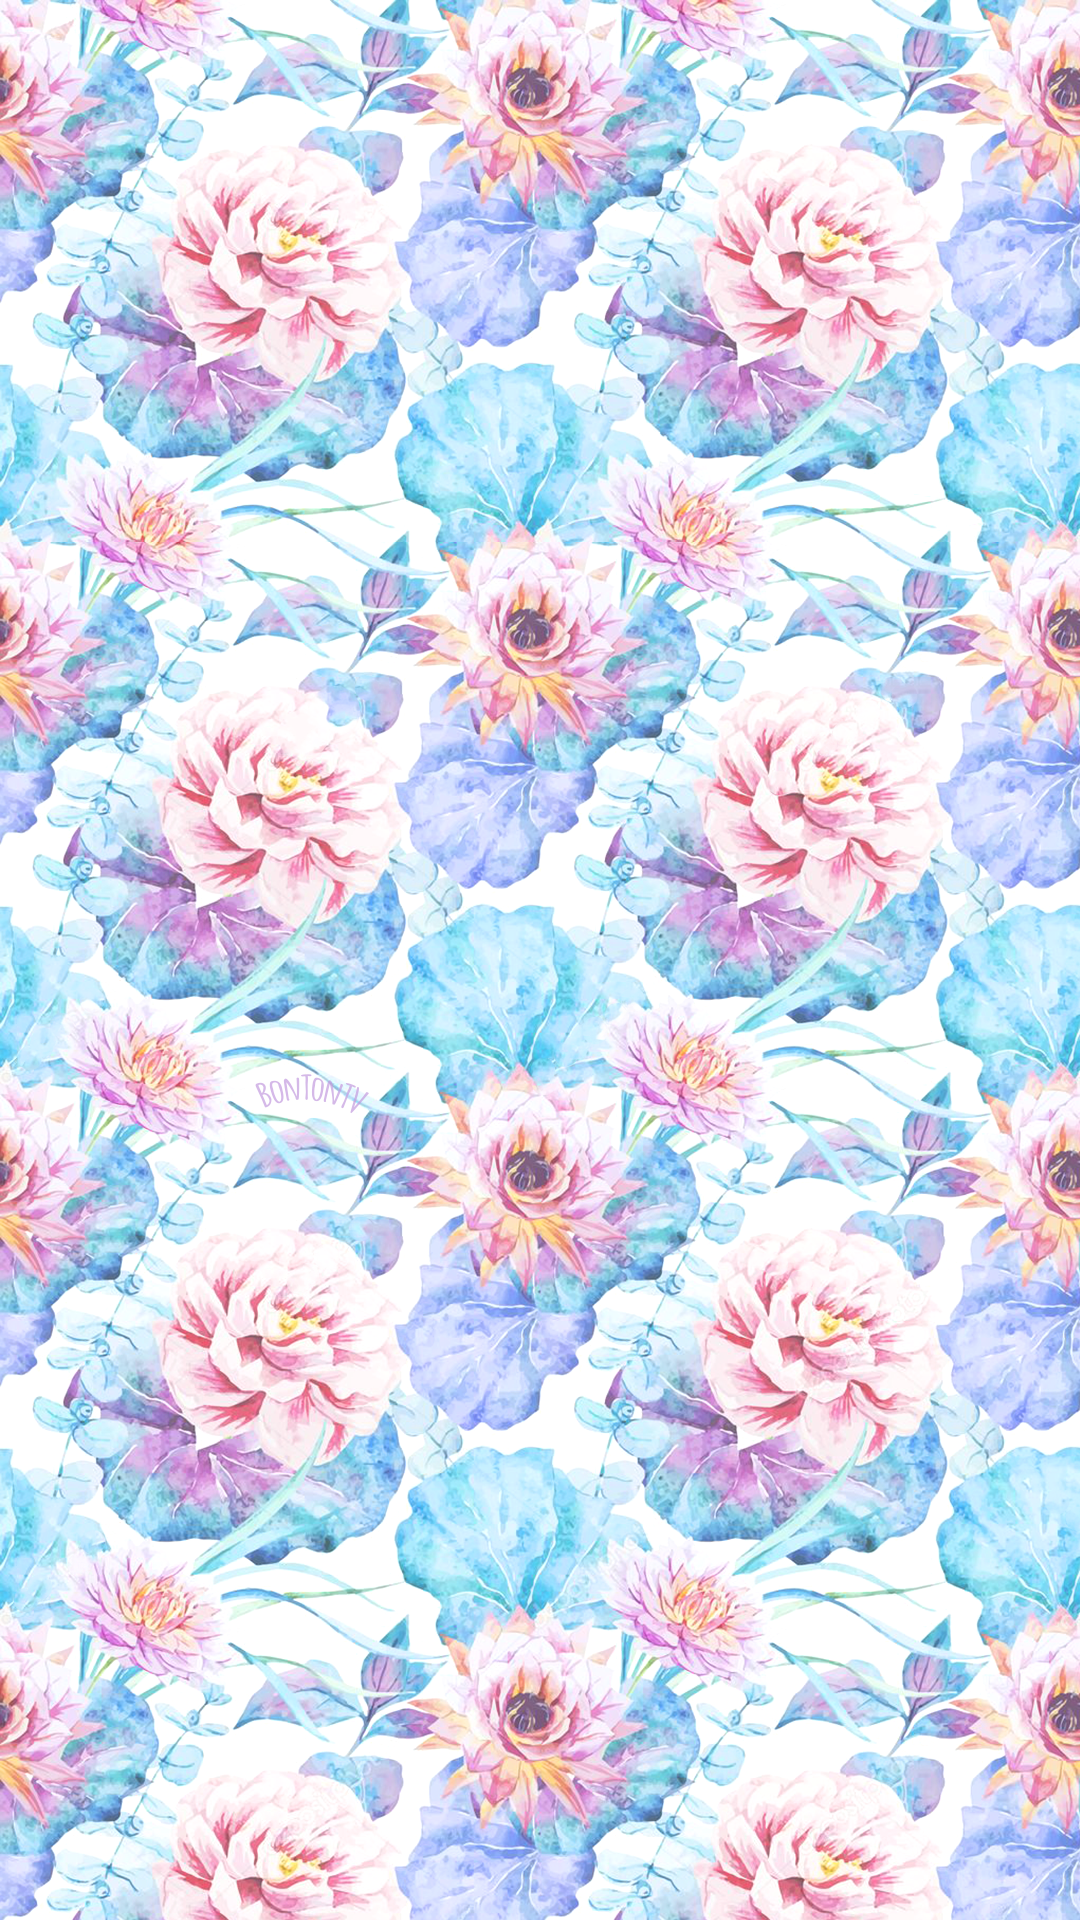 Phone Wallpapers Hd Watercolor Flowers Pattern By Bonton Tv Free Backgrounds 1080x Flower Phone Wallpaper Artsy Wallpaper Iphone Love Wallpaper Backgrounds